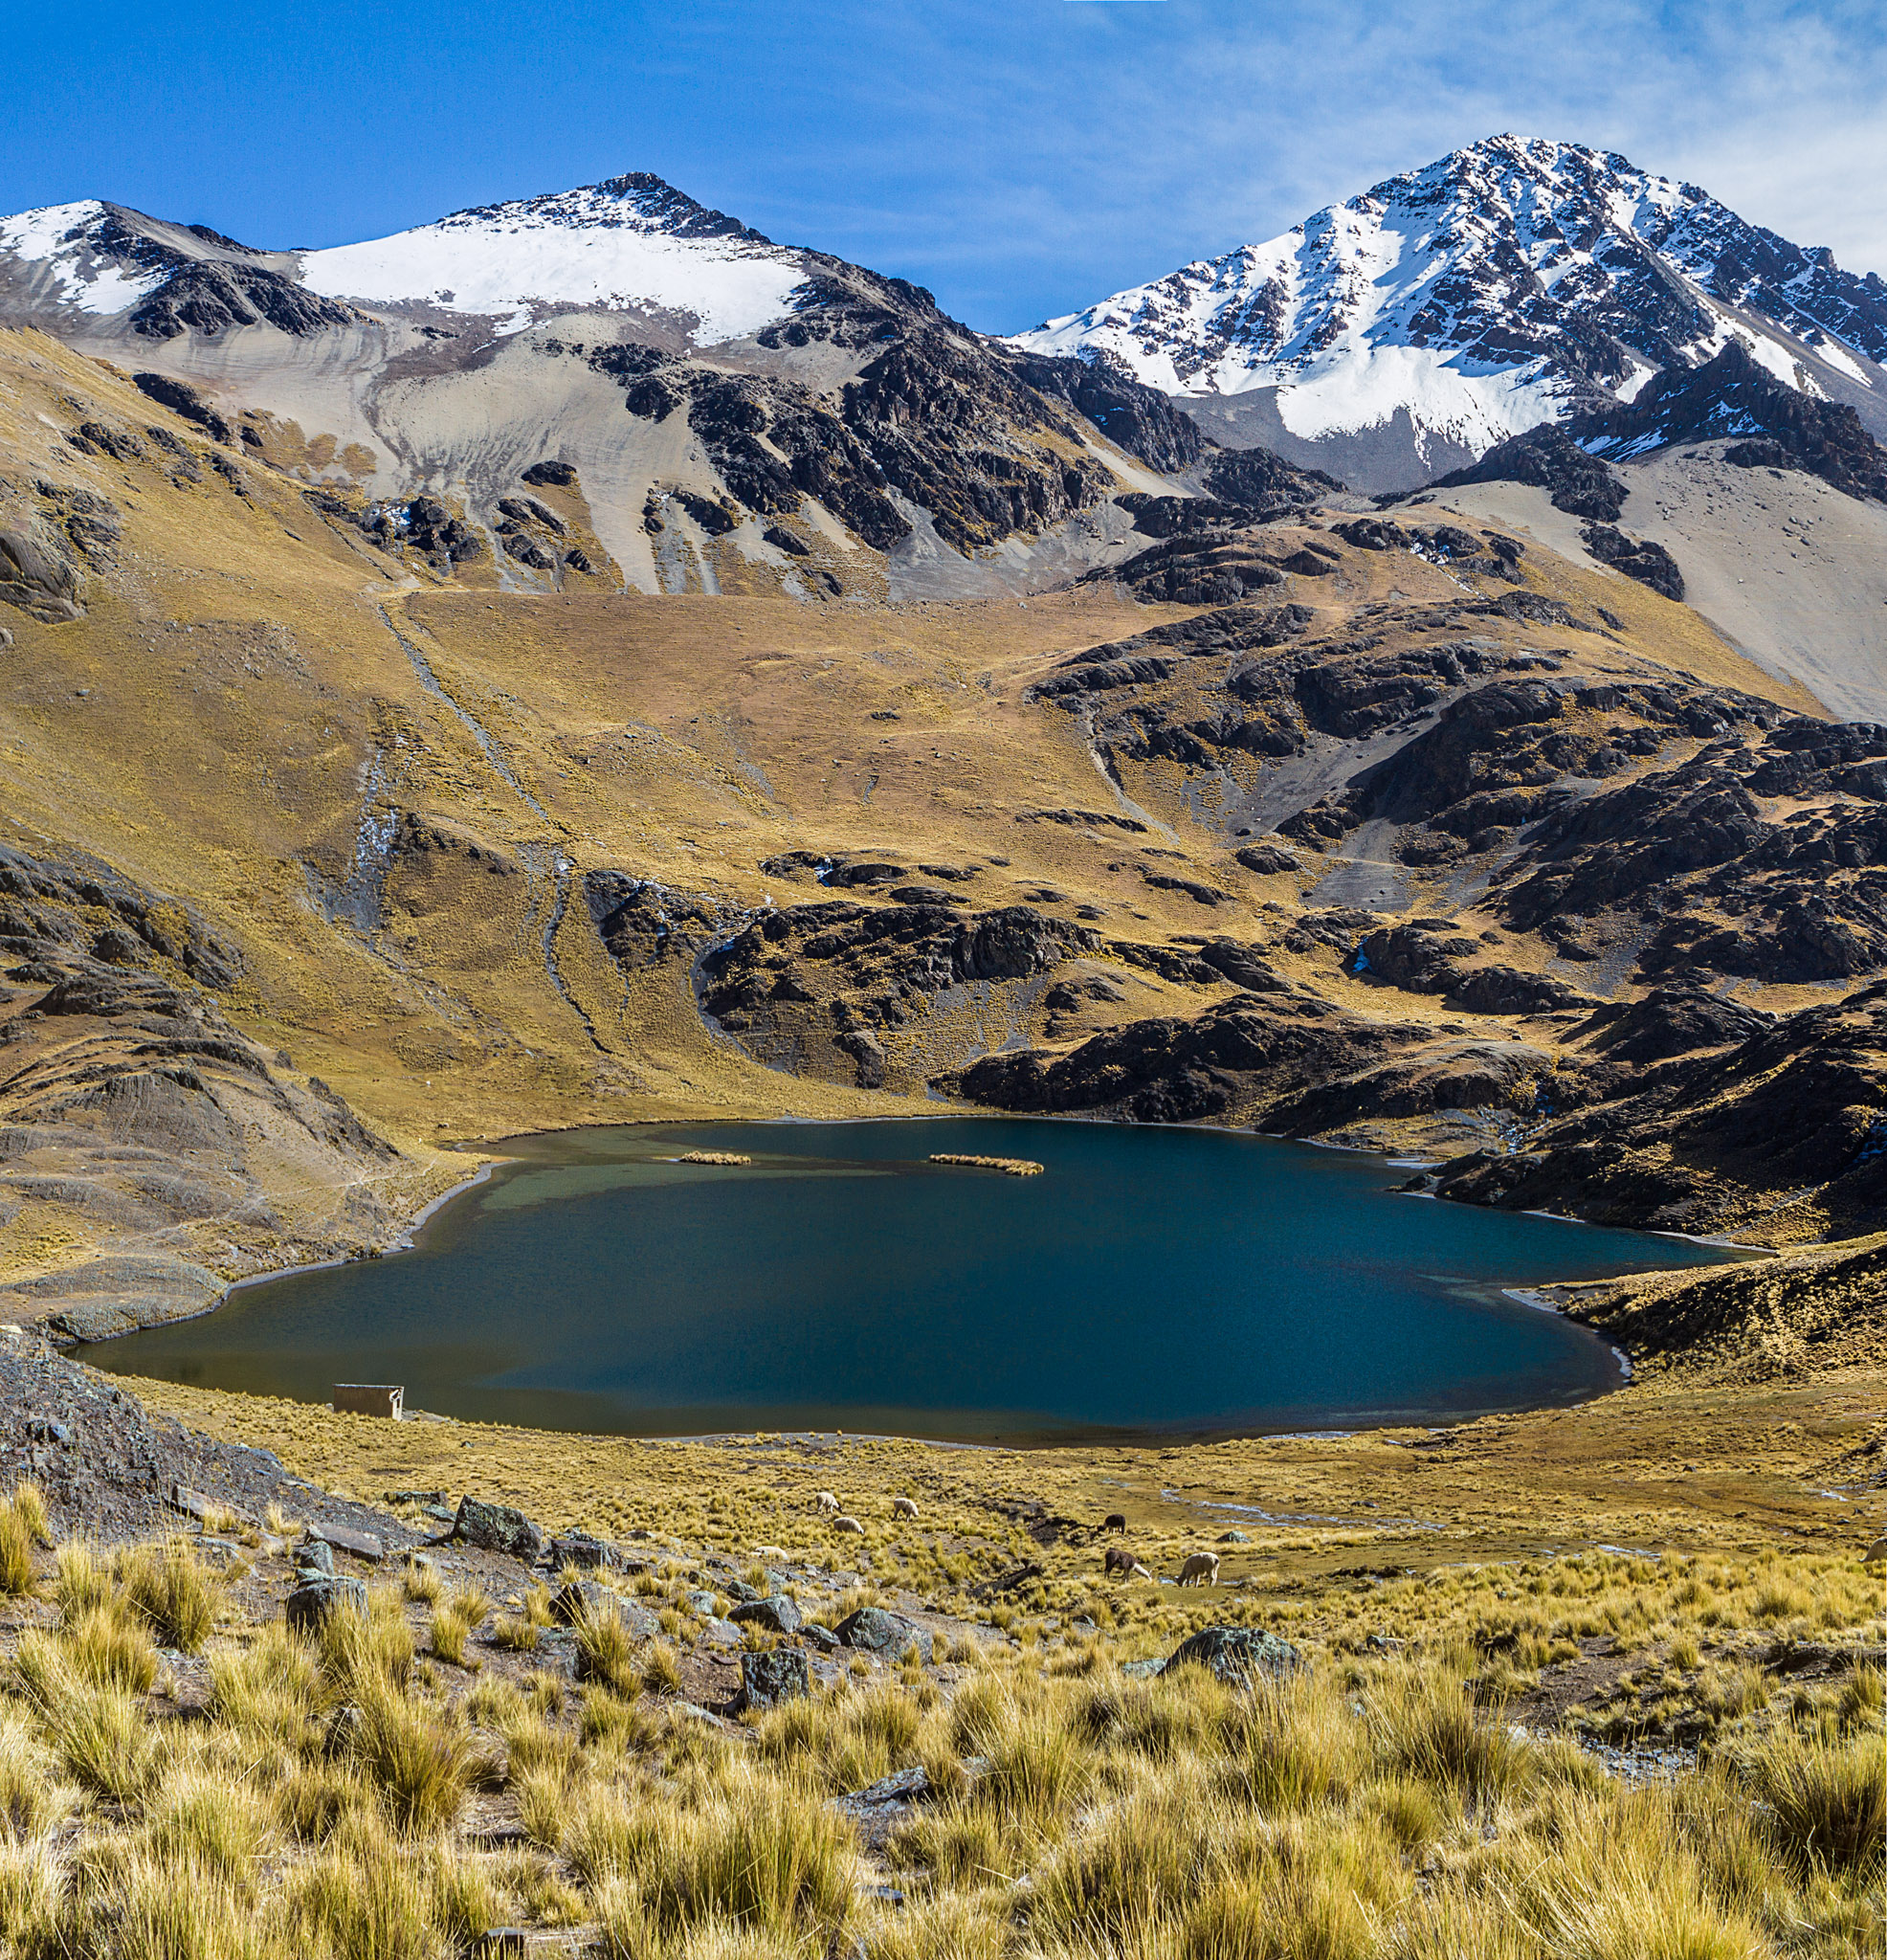 Ali-Barqawi-Studios-Explore-Series-Travel-Adventure-Documentary-C4CGAZA-Bolivia-Mount-Tarija-2015-244.jpg